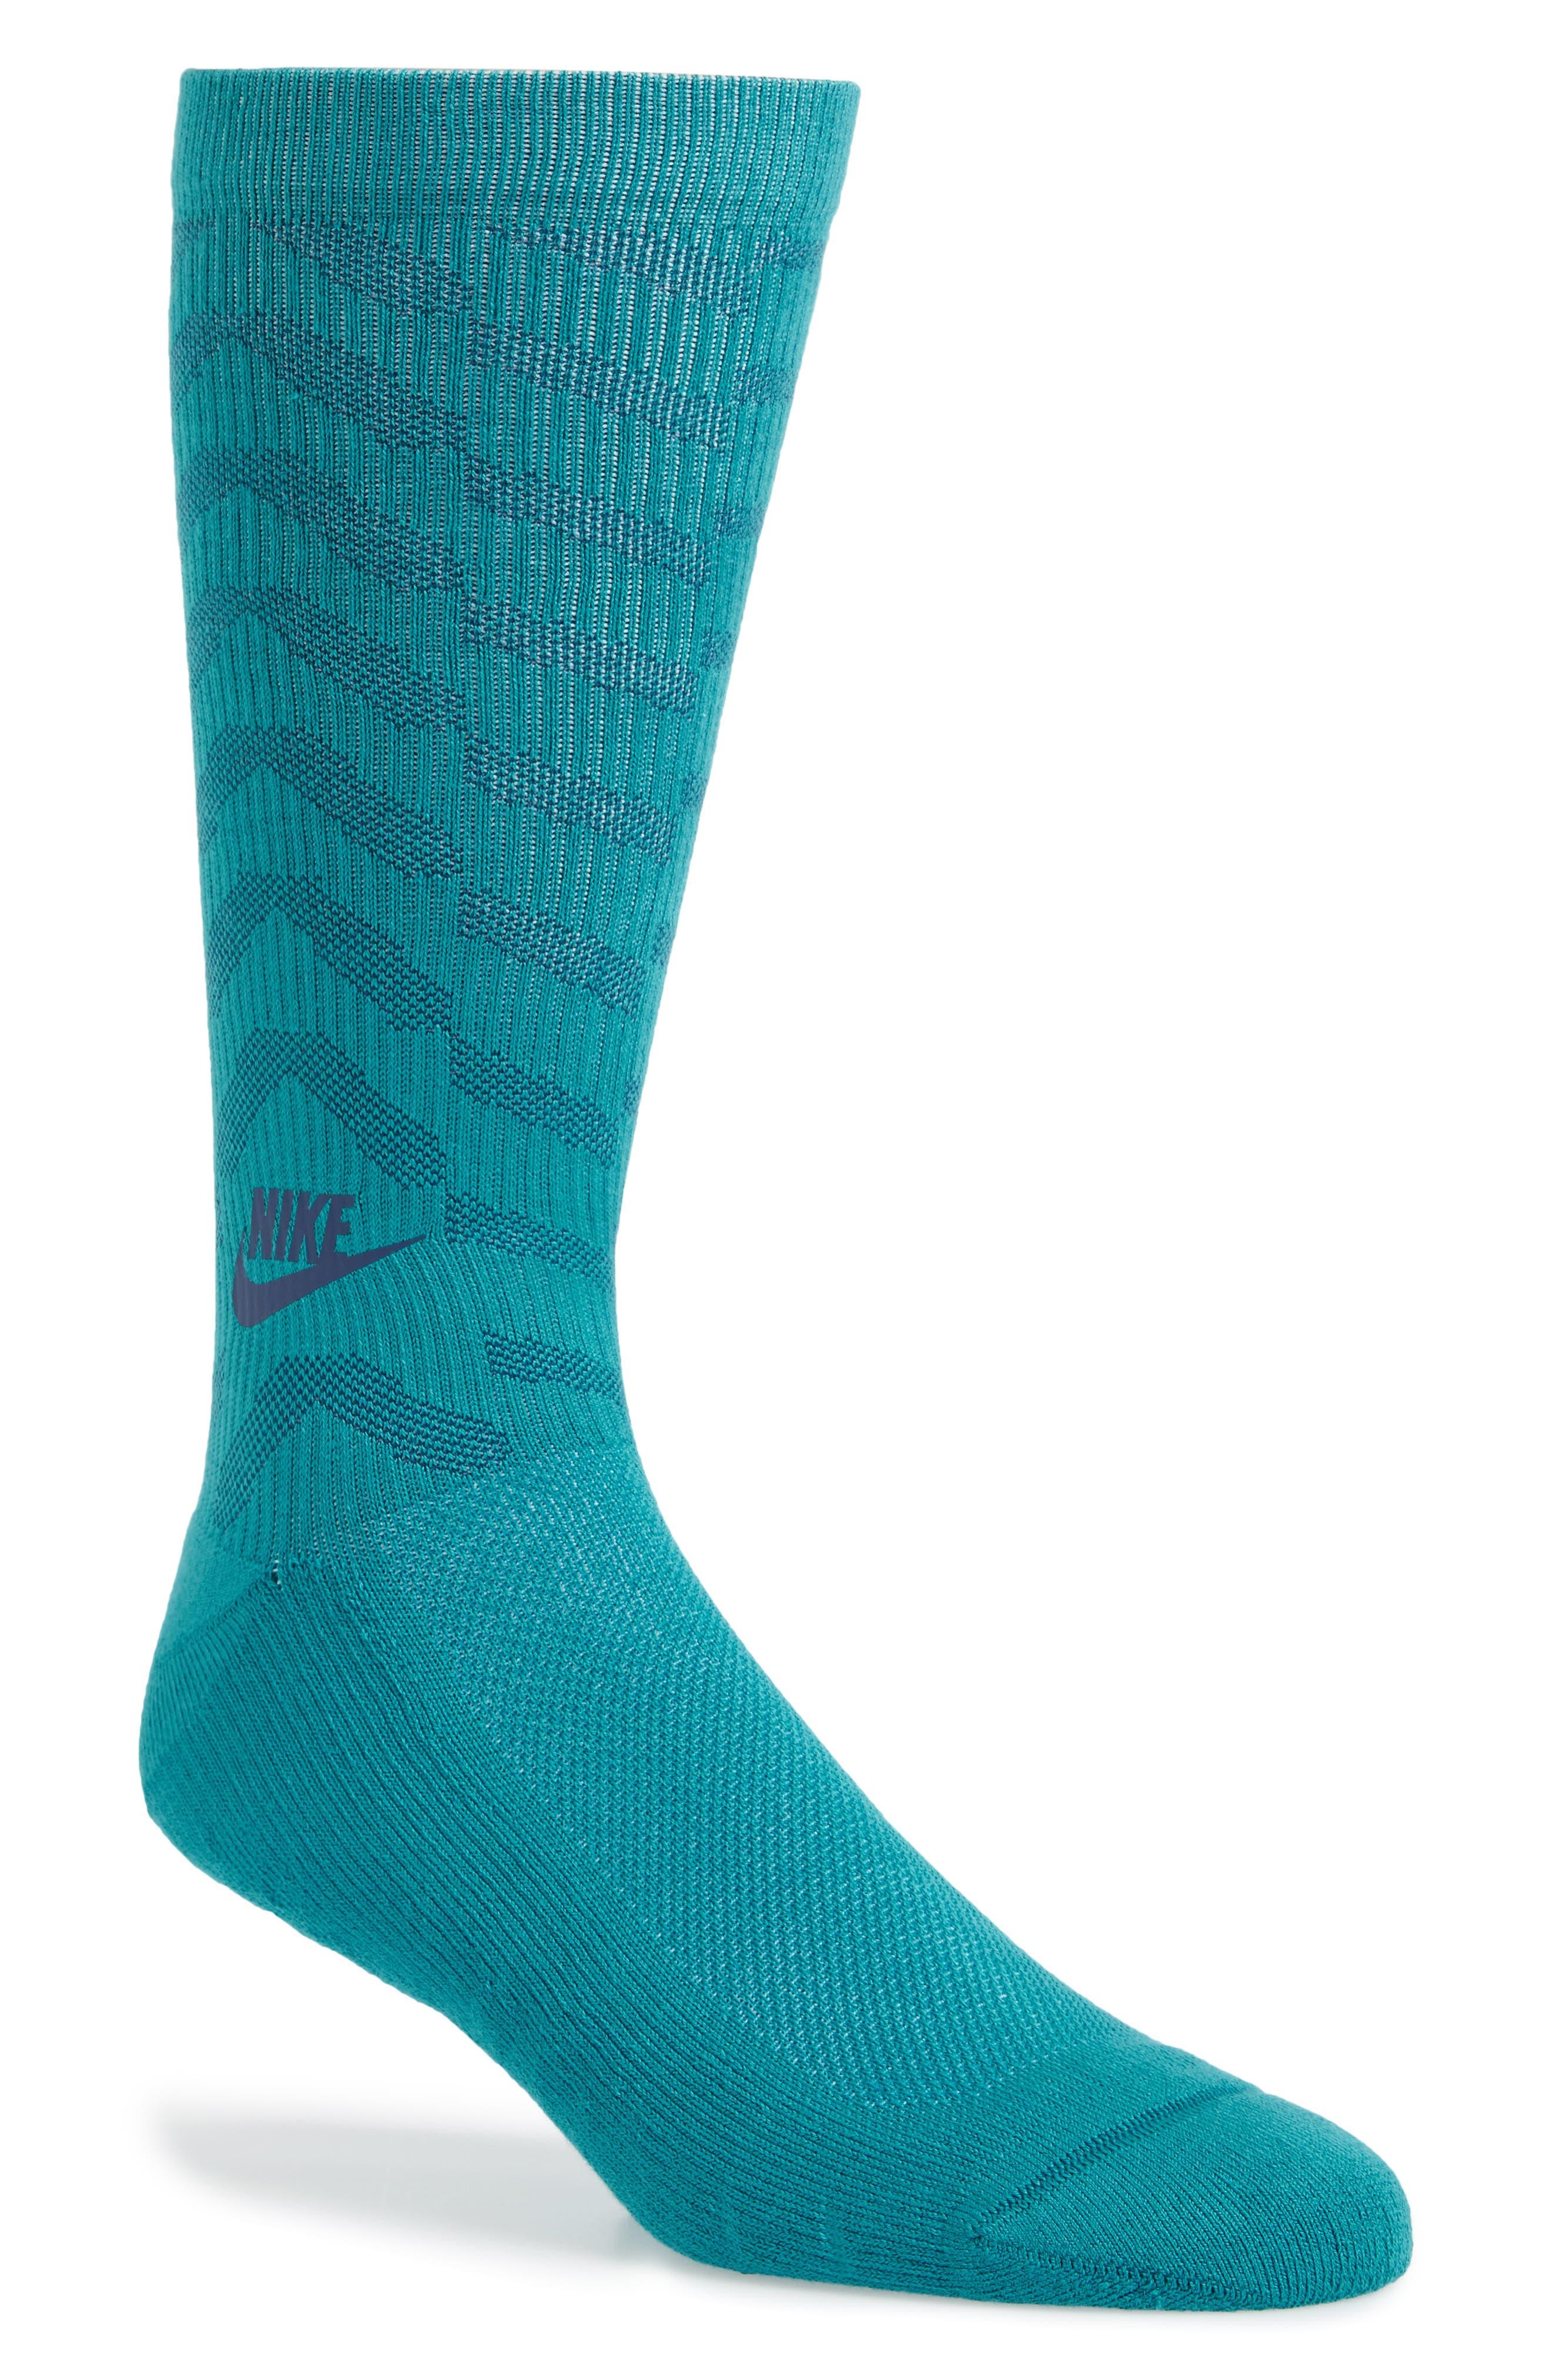 Main Image - Nike Statement Graphic Socks